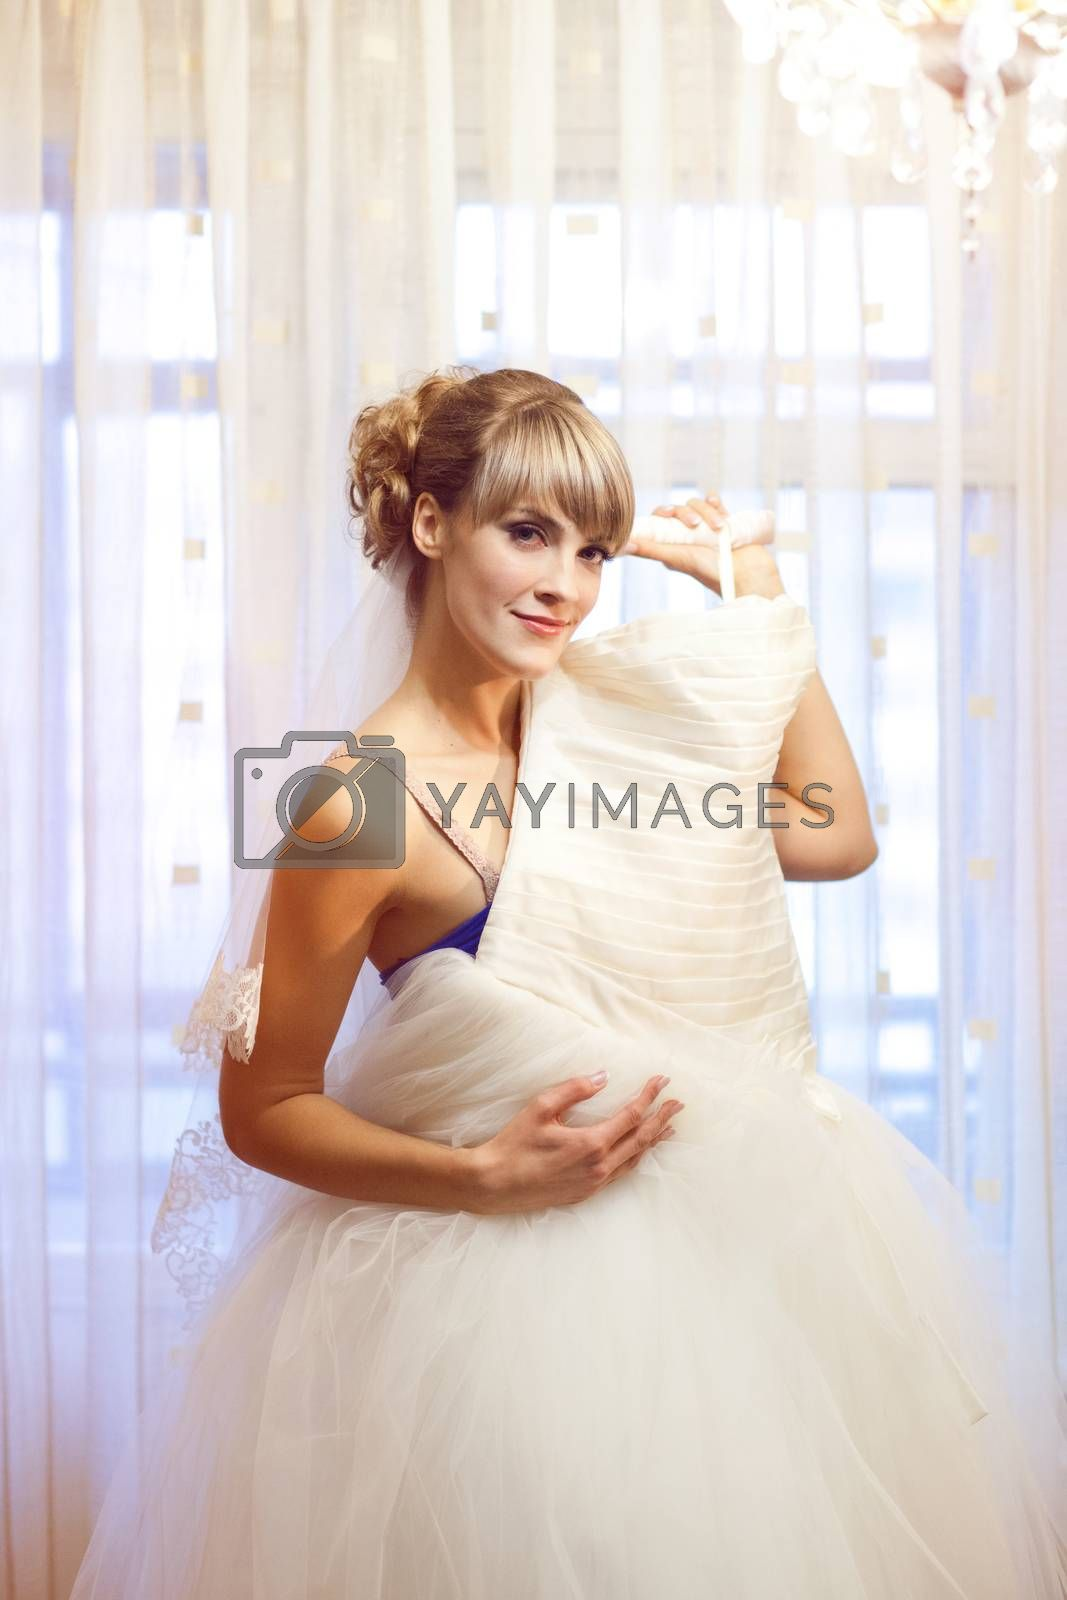 girl with wedding dress